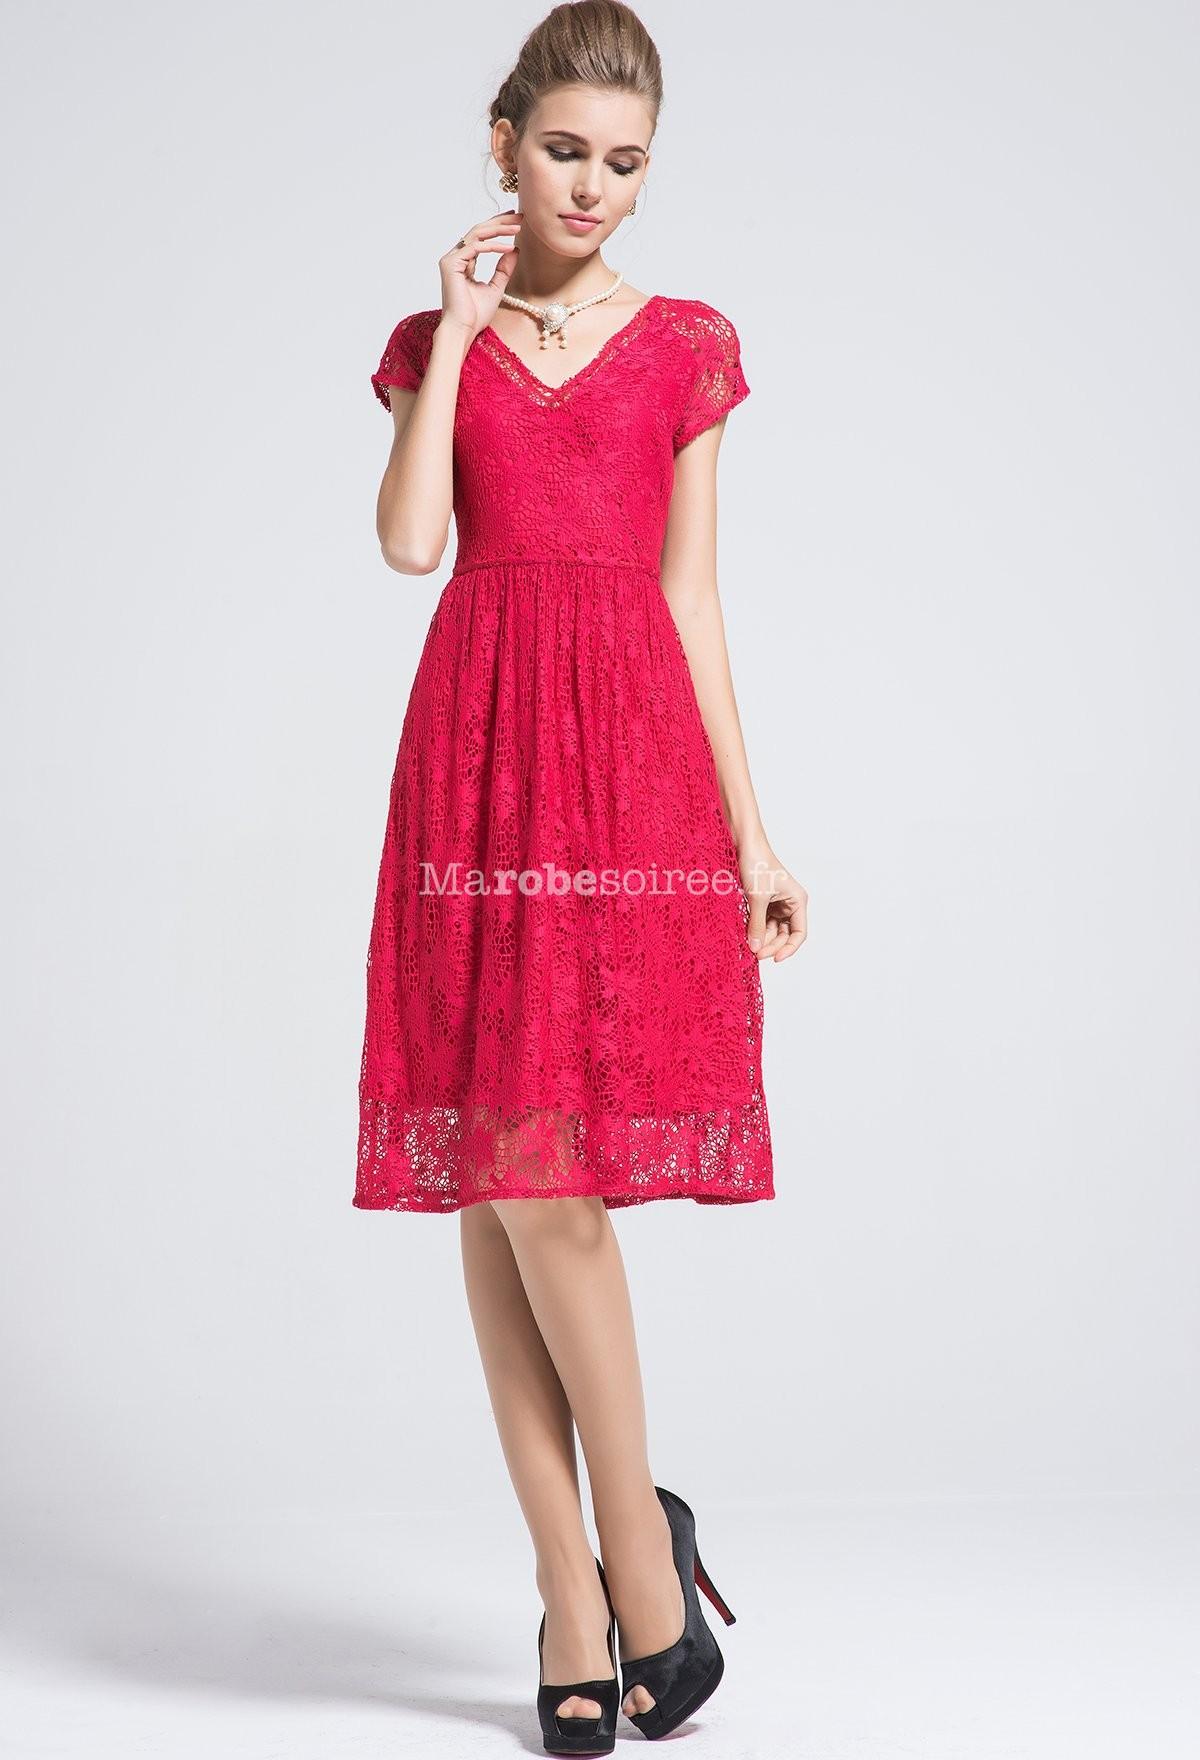 Robe rouge manche courte